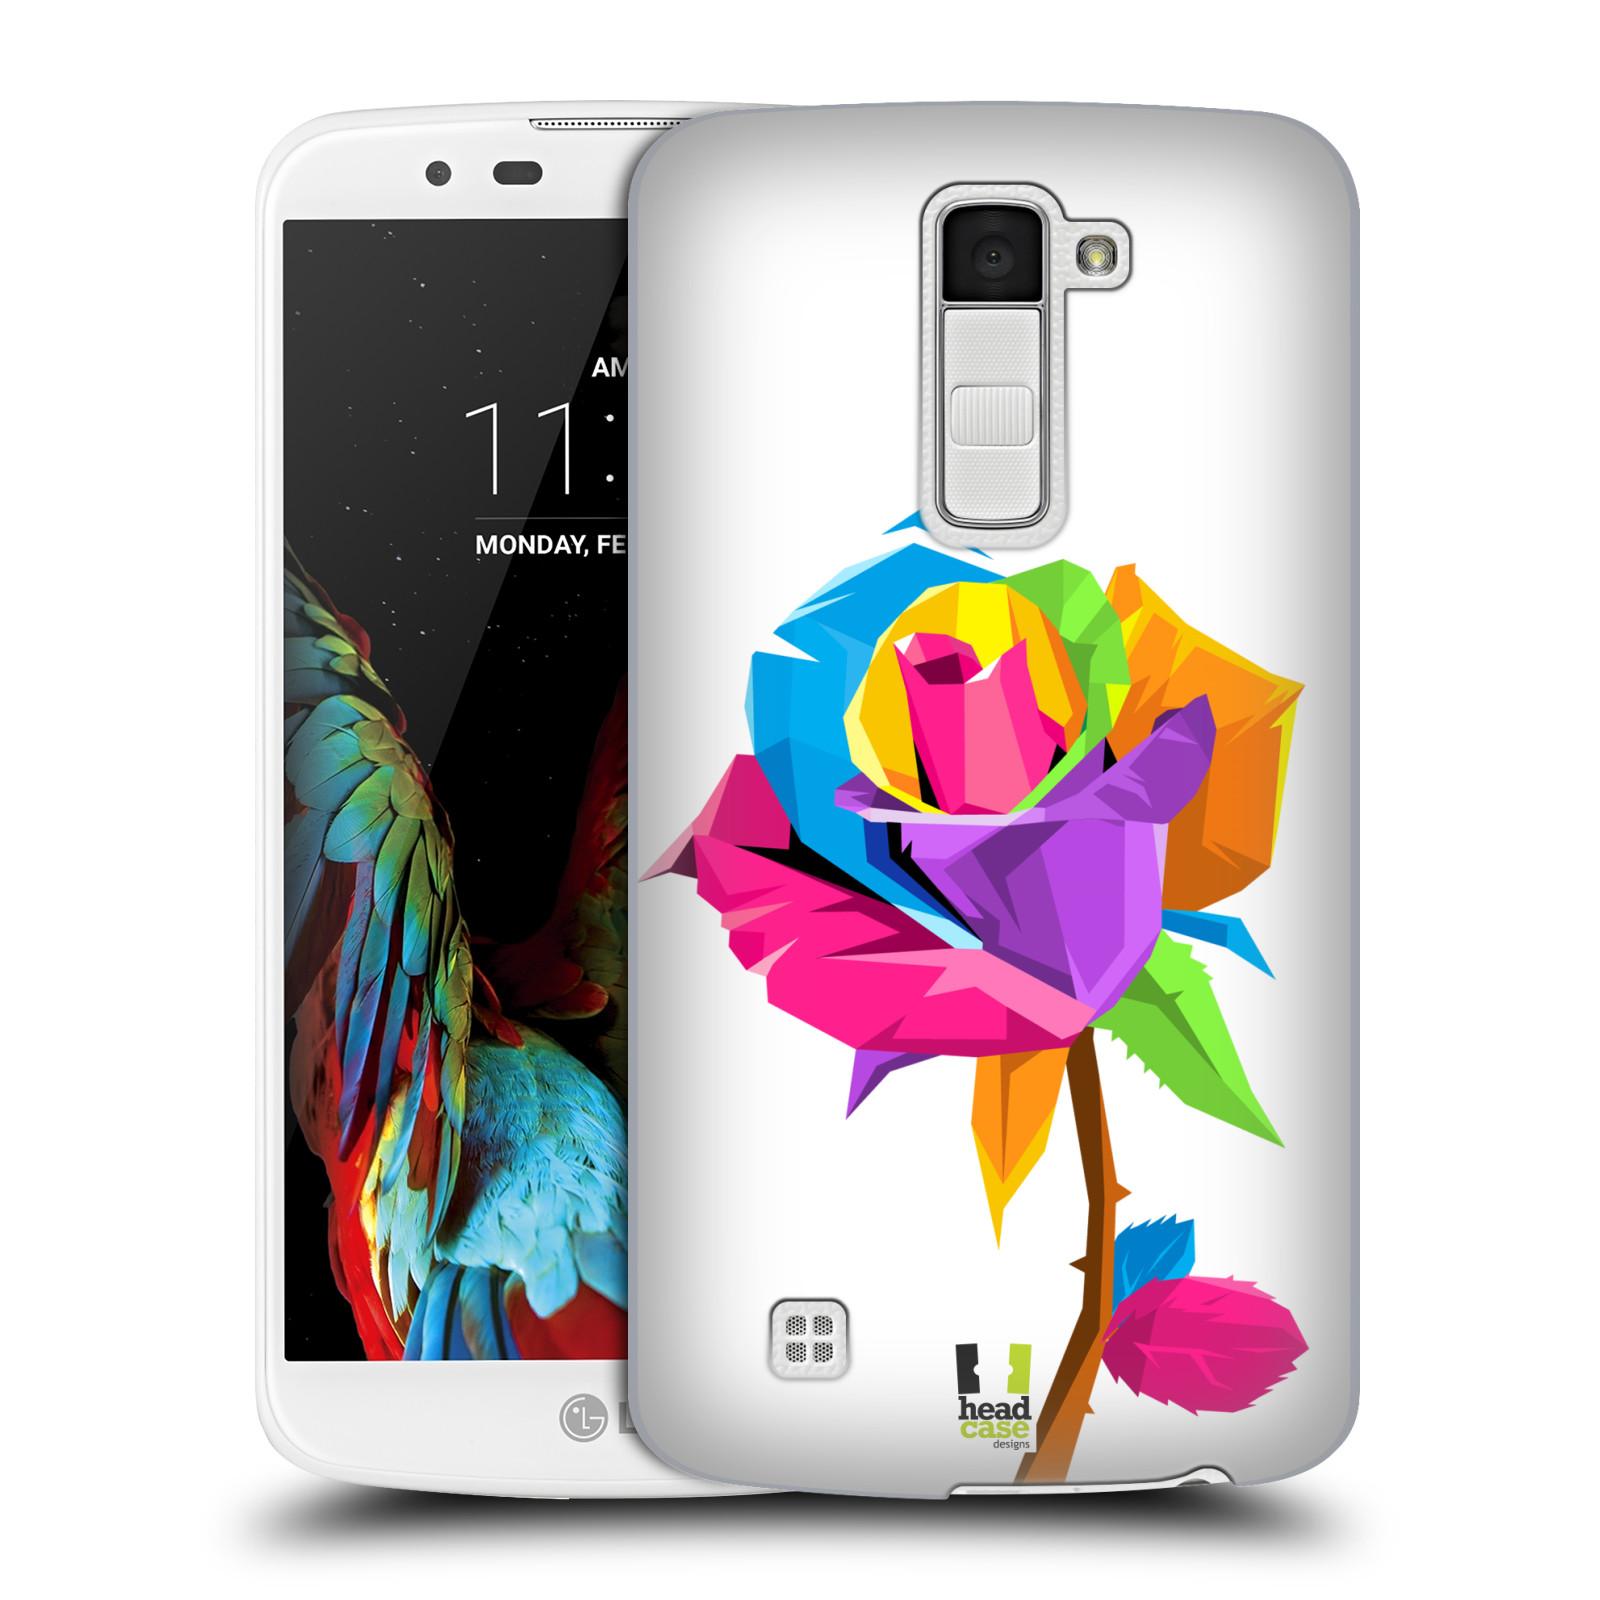 HEAD CASE plastový obal na mobil LG K10 vzor POP ART kubismus růže